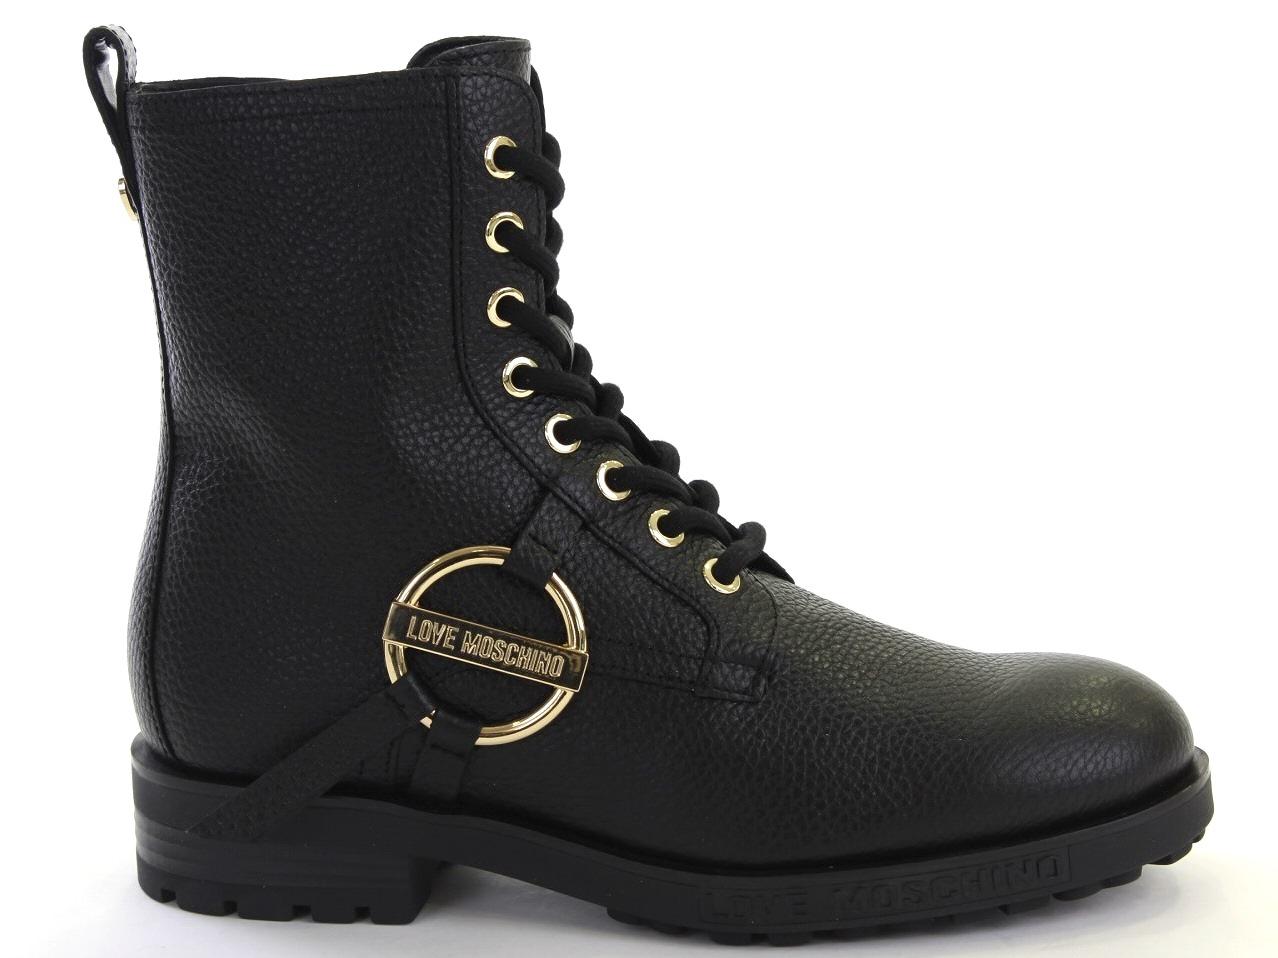 Flat Ankle Boots Love Moschino   Moschino - 664 JA24144GIDIC